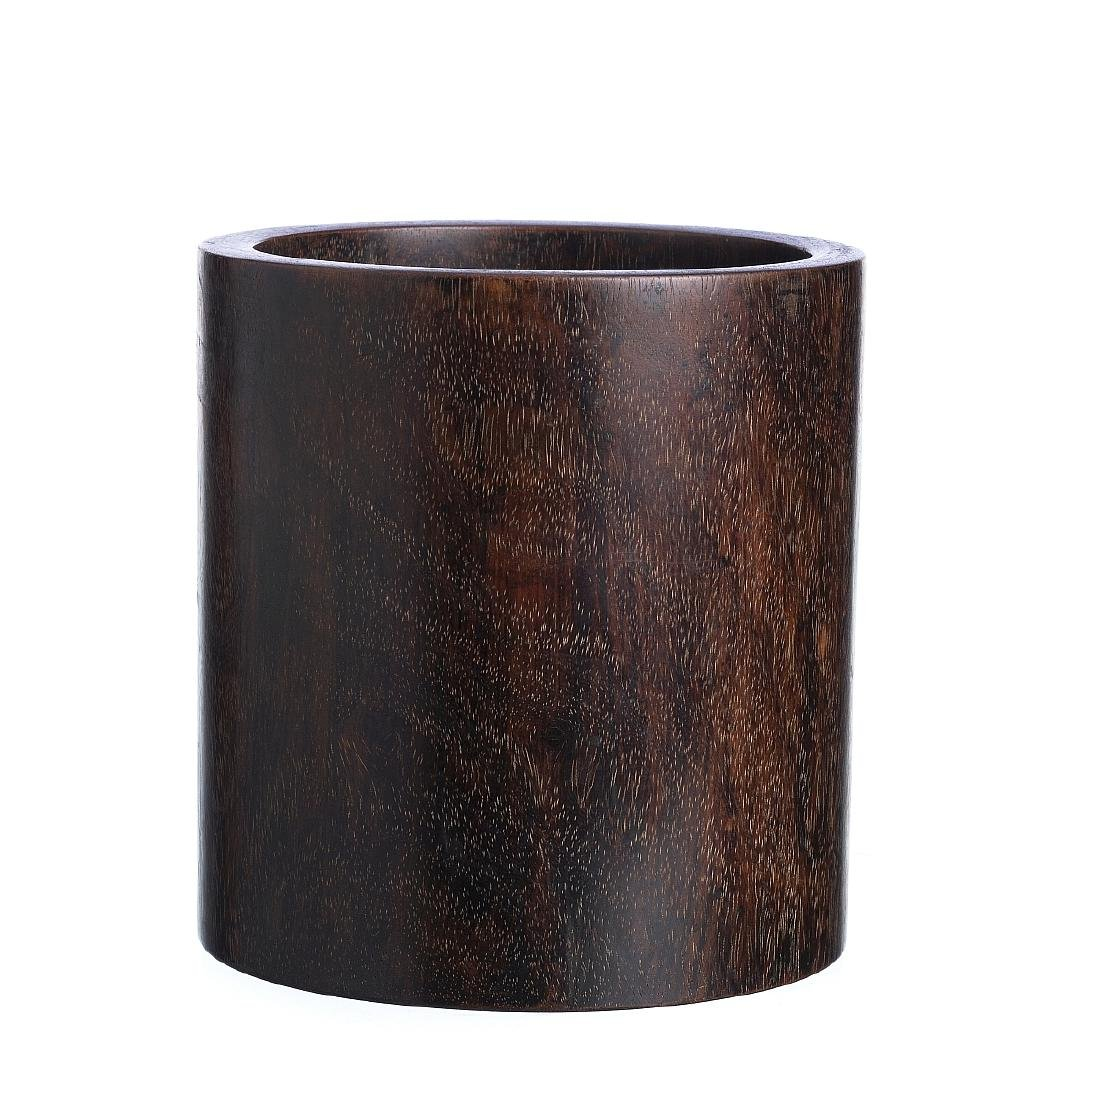 Brushpot in wood, Republic